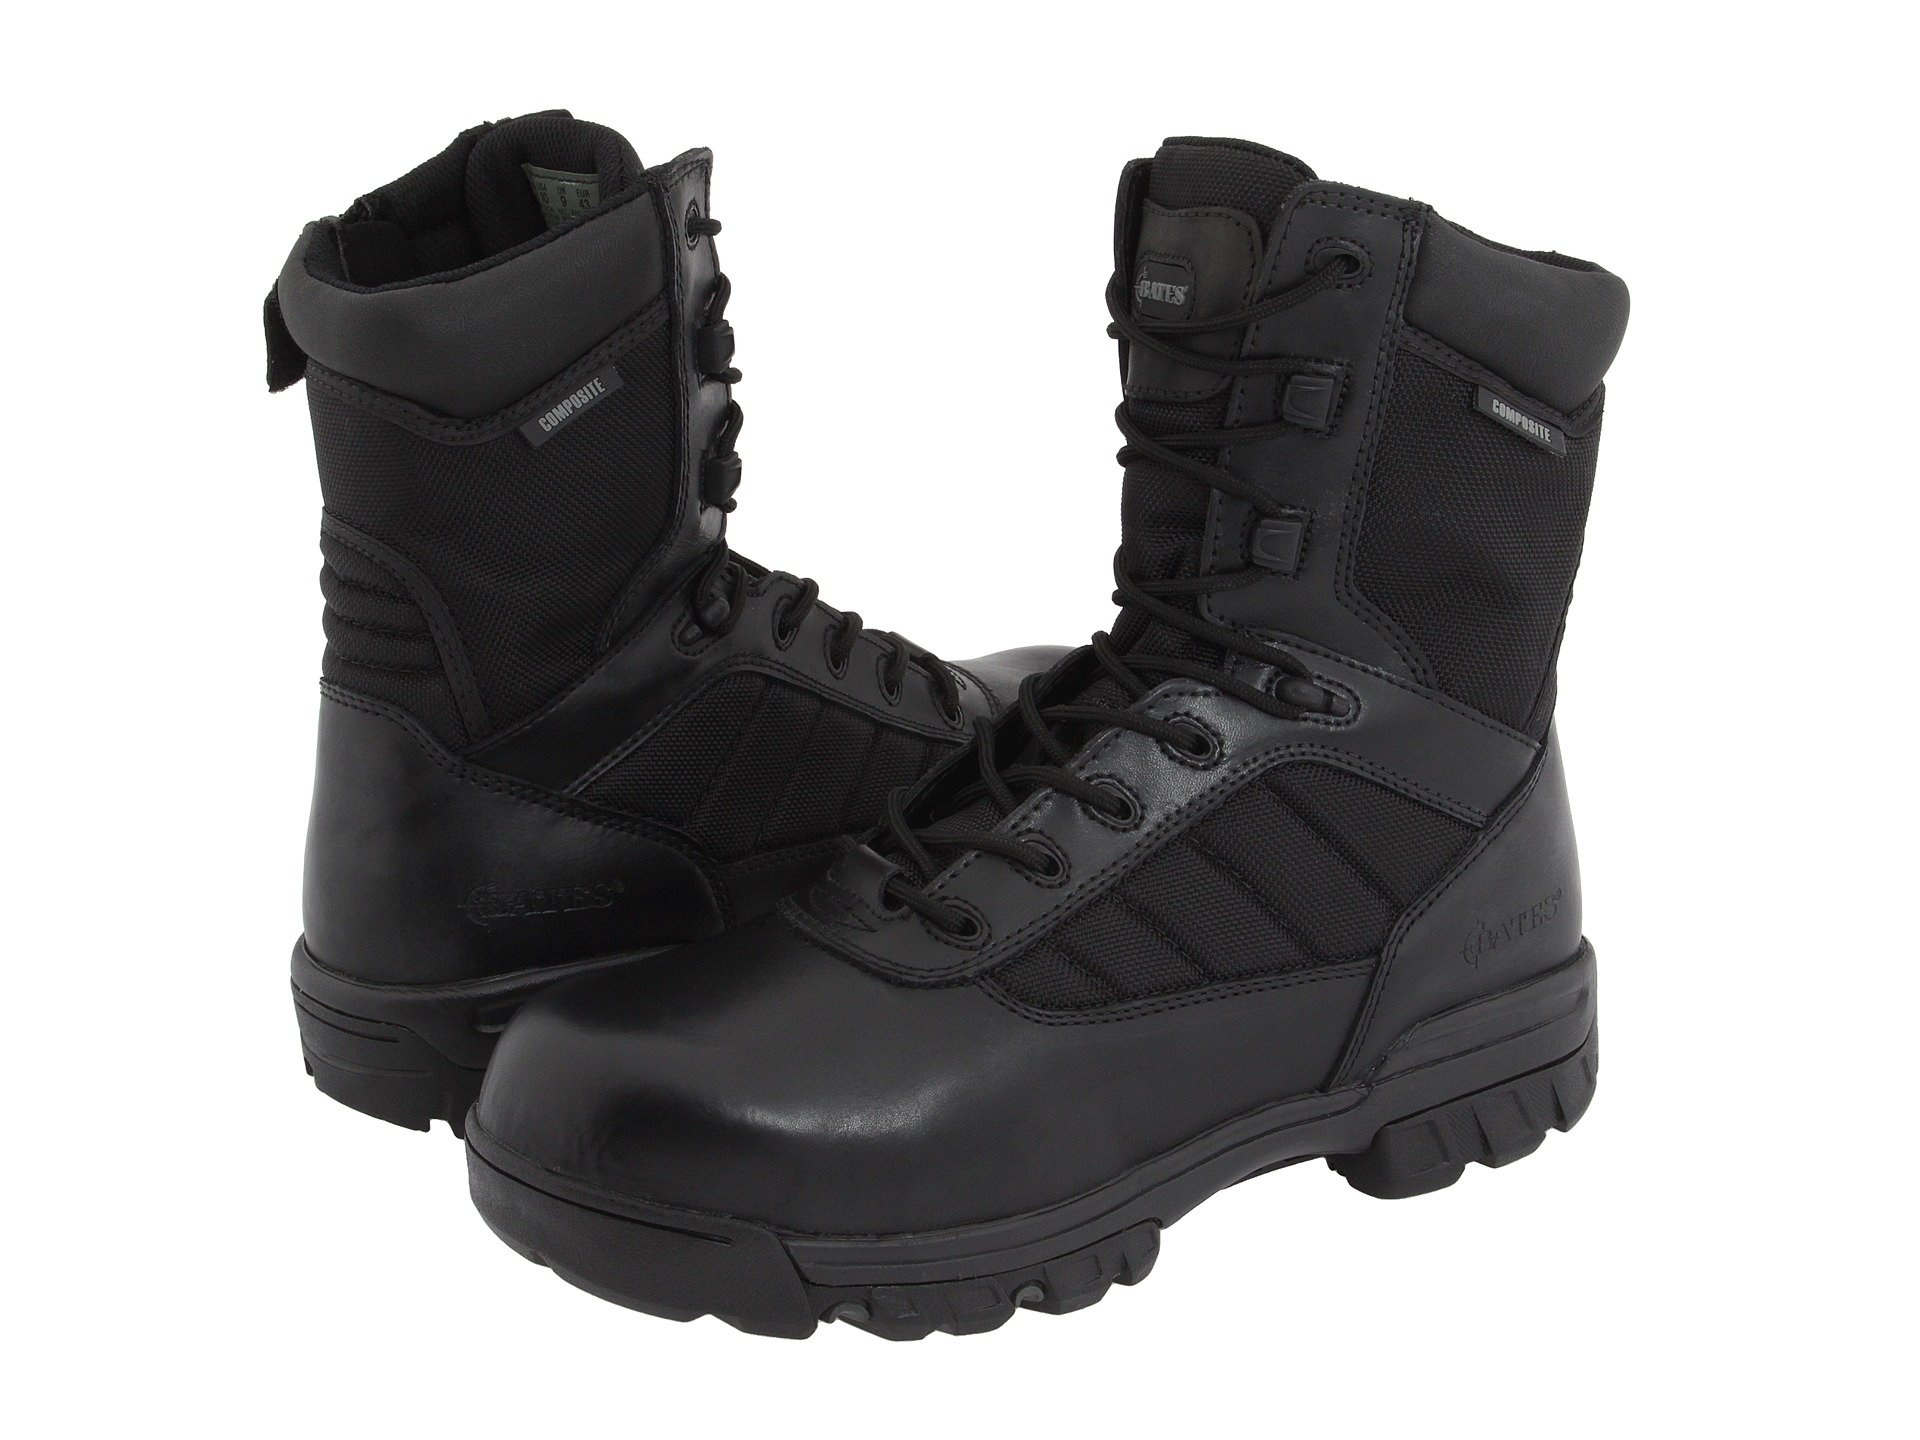 bates toe chaussures 8 & # 34; tactique composite de toe bates côté zip sport 8fe117